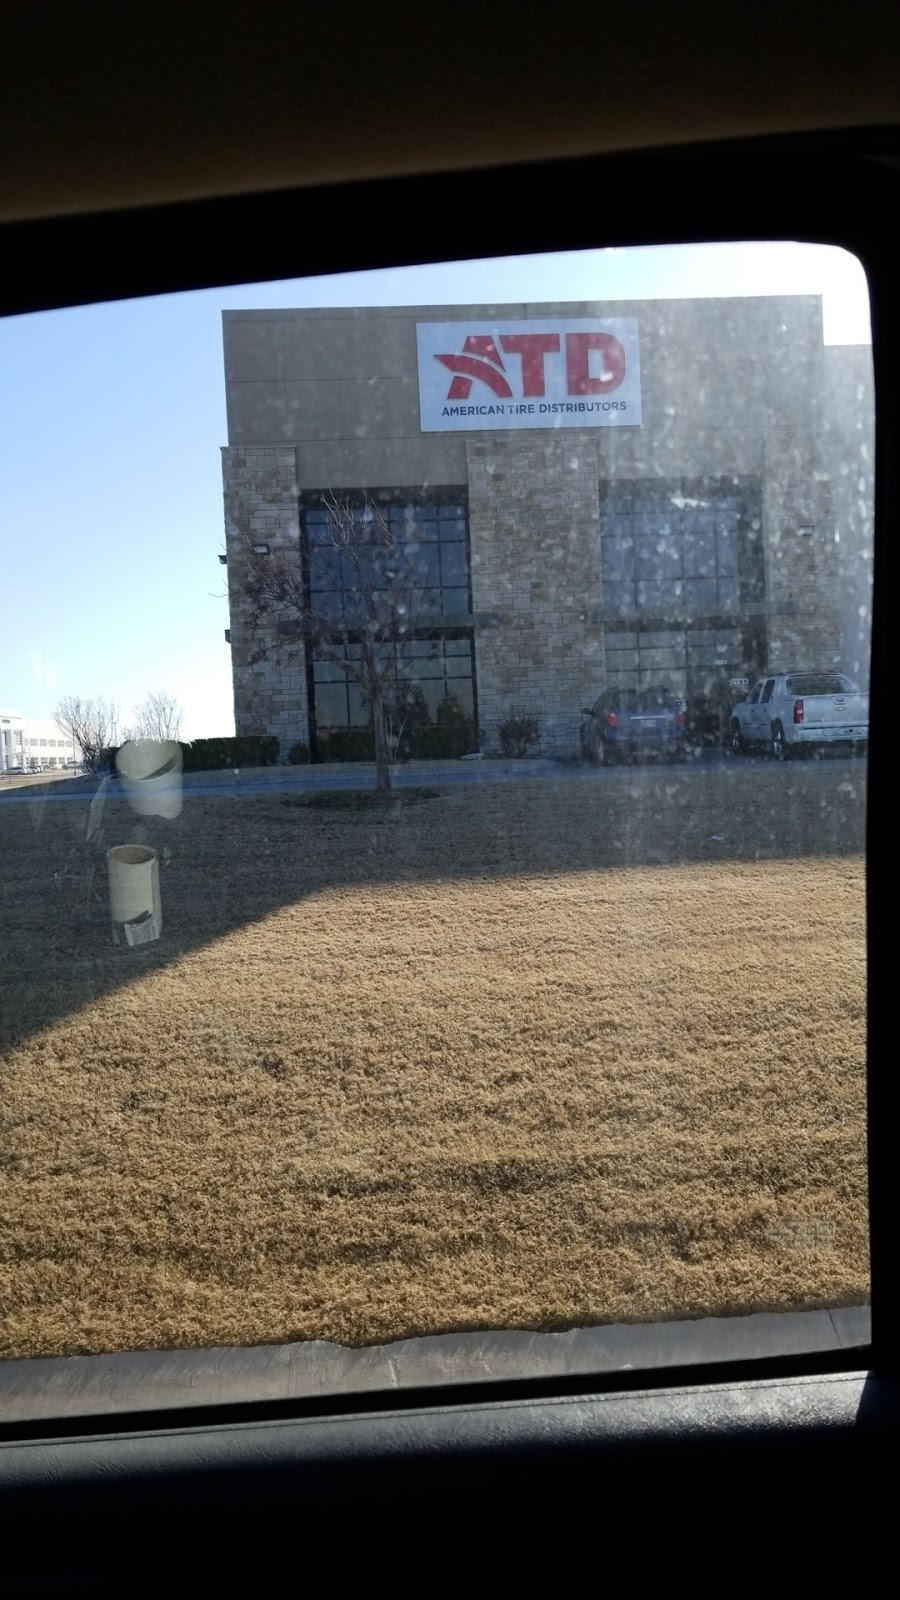 American Tire Distributors - car repair  | Photo 6 of 6 | Address: 4223 N Garnett Rd, Tulsa, OK 74116, USA | Phone: (918) 877-4332